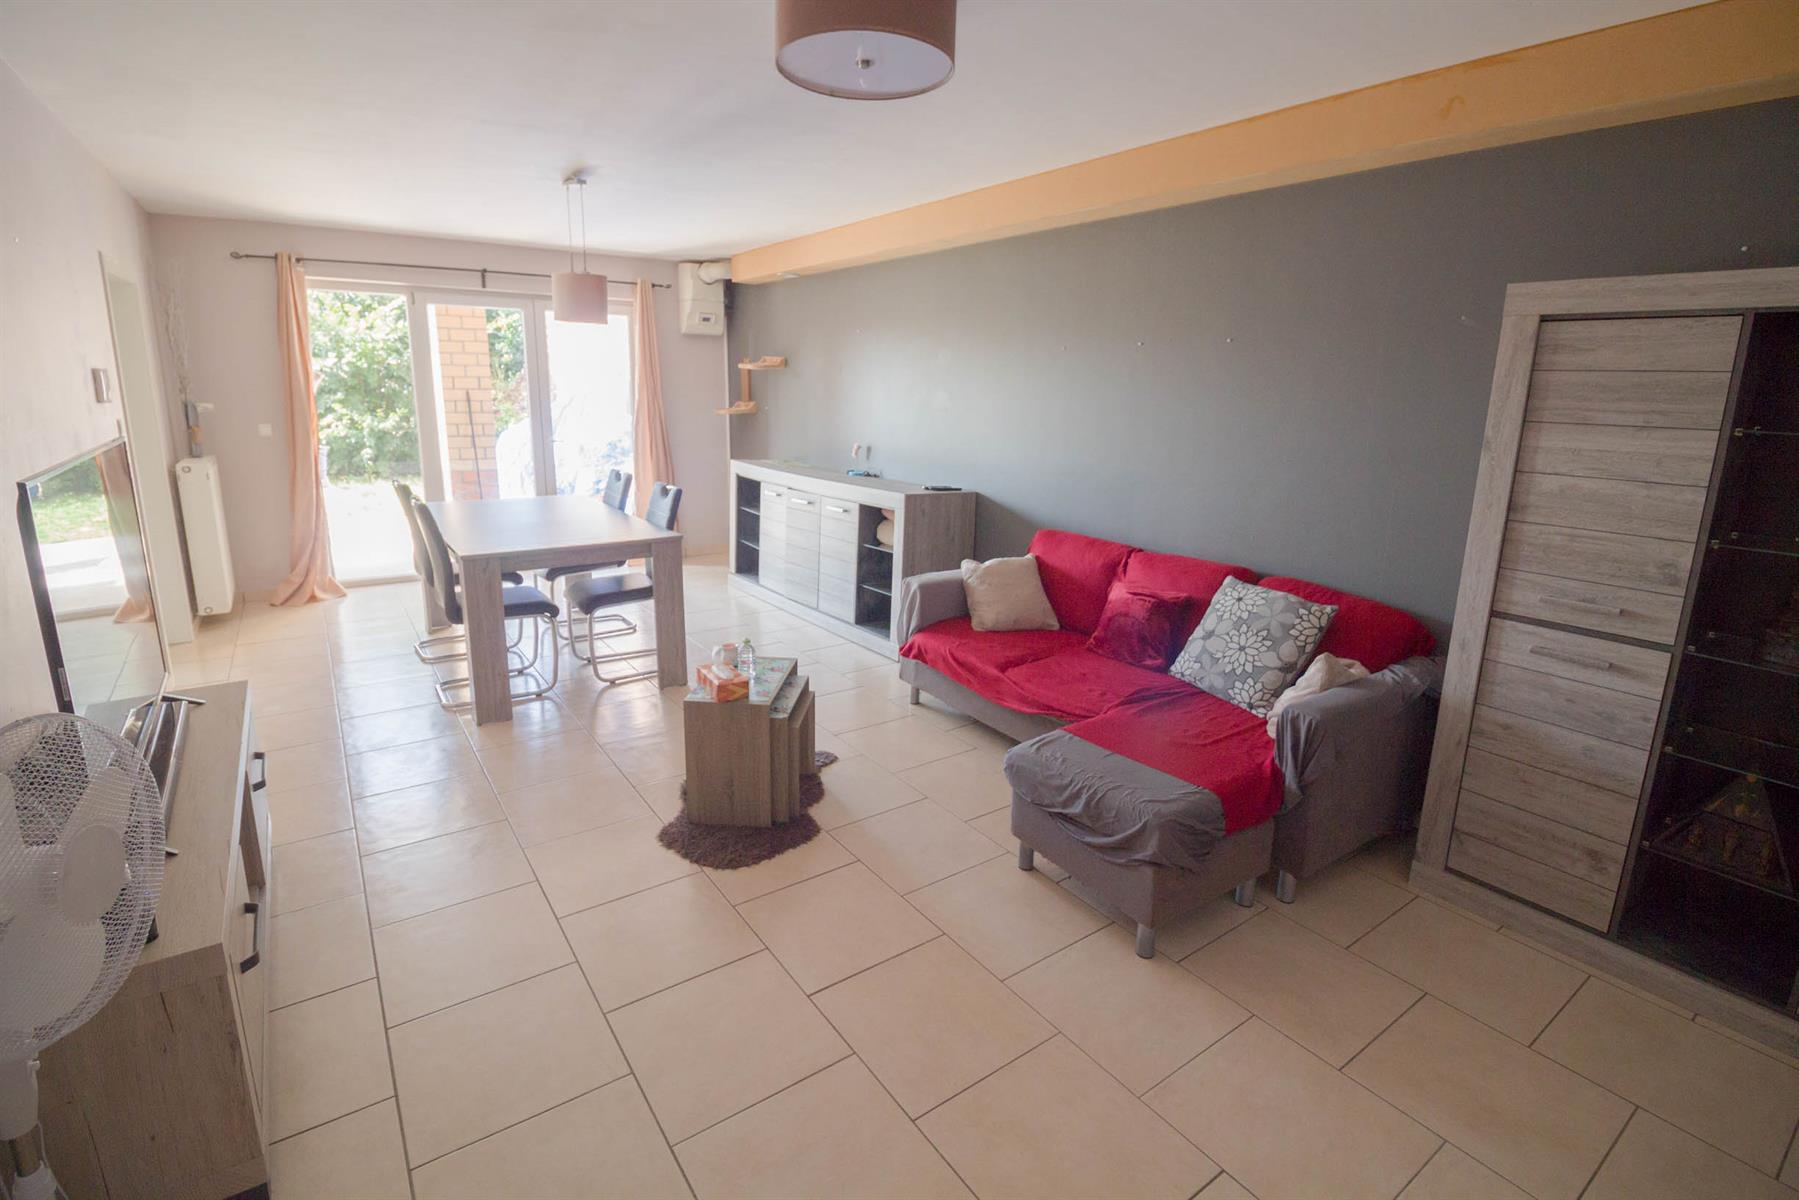 Appartement - Charleroi - #4149545-4